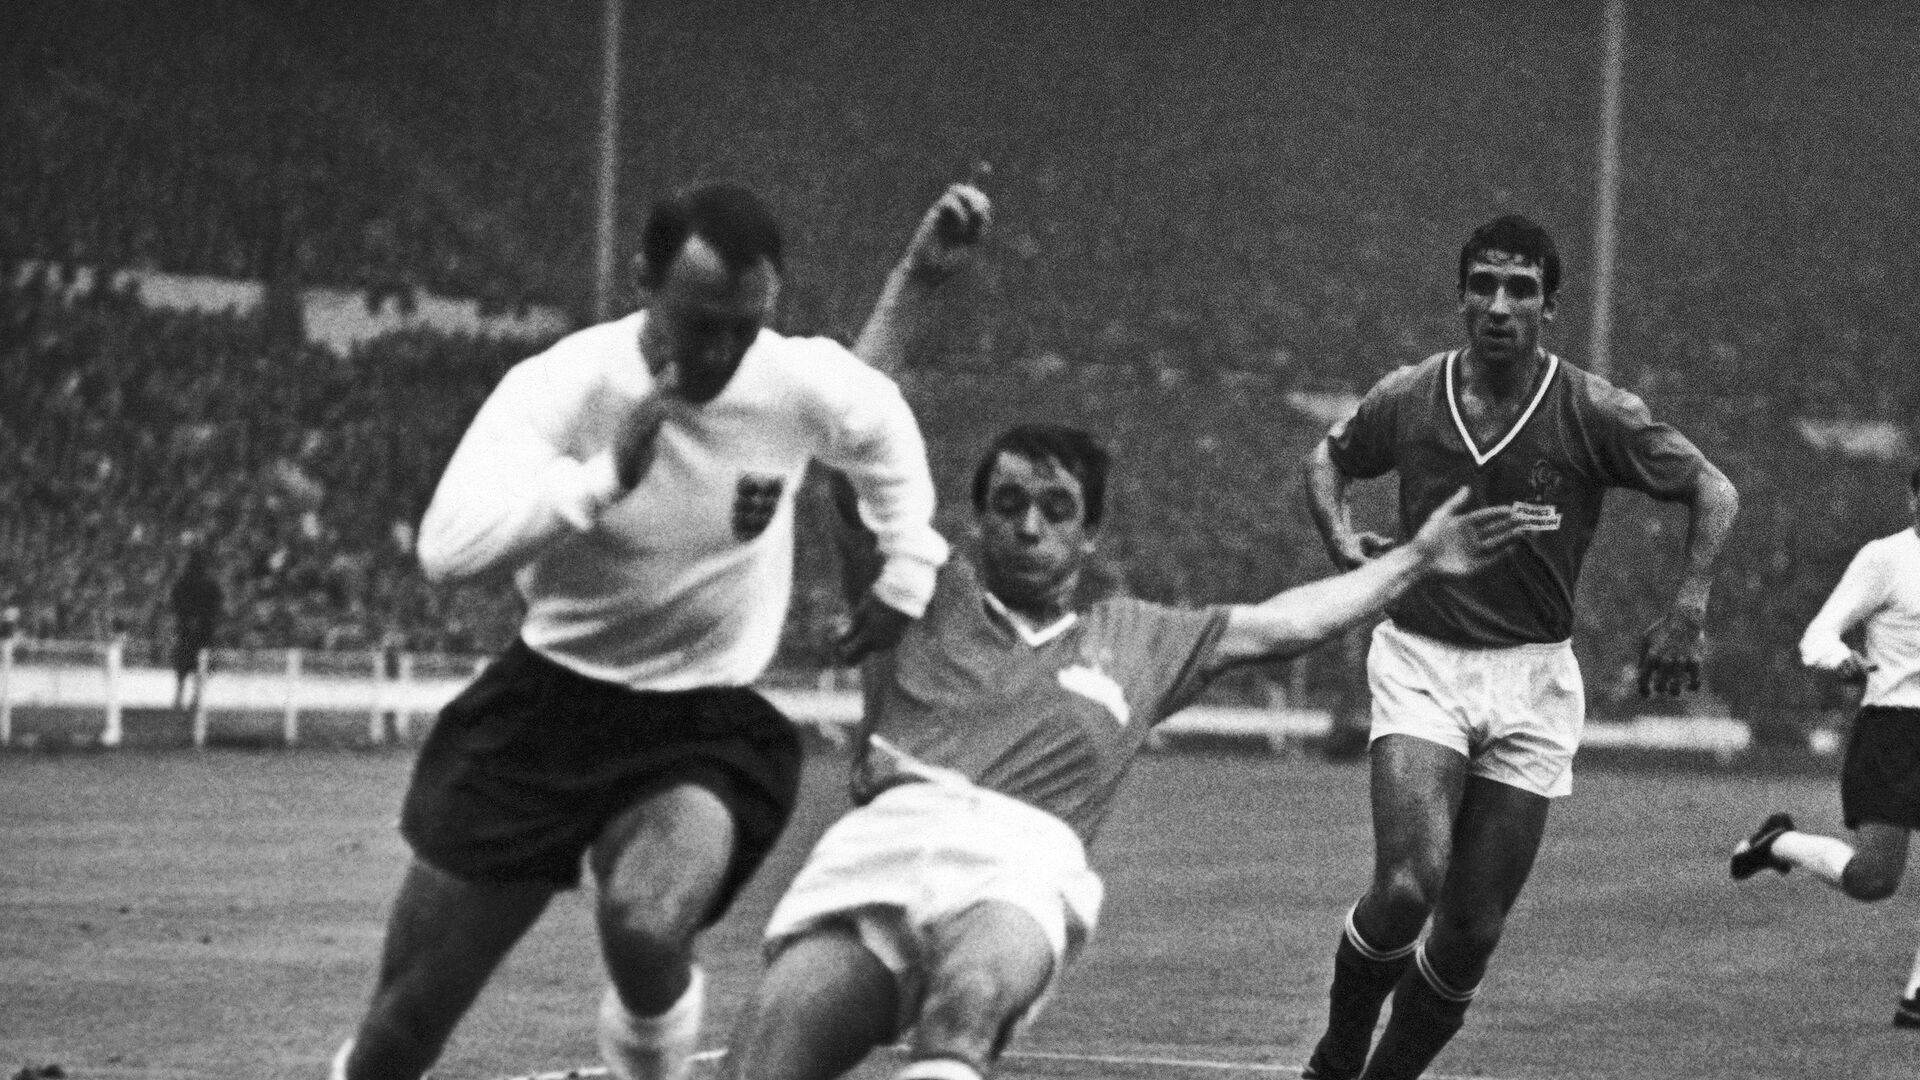 Нападающий сборной Англии по футболу Джимми Гривз (слева) в матче чемпионата мира-1966 с командой Франции - РИА Новости, 1920, 19.09.2021